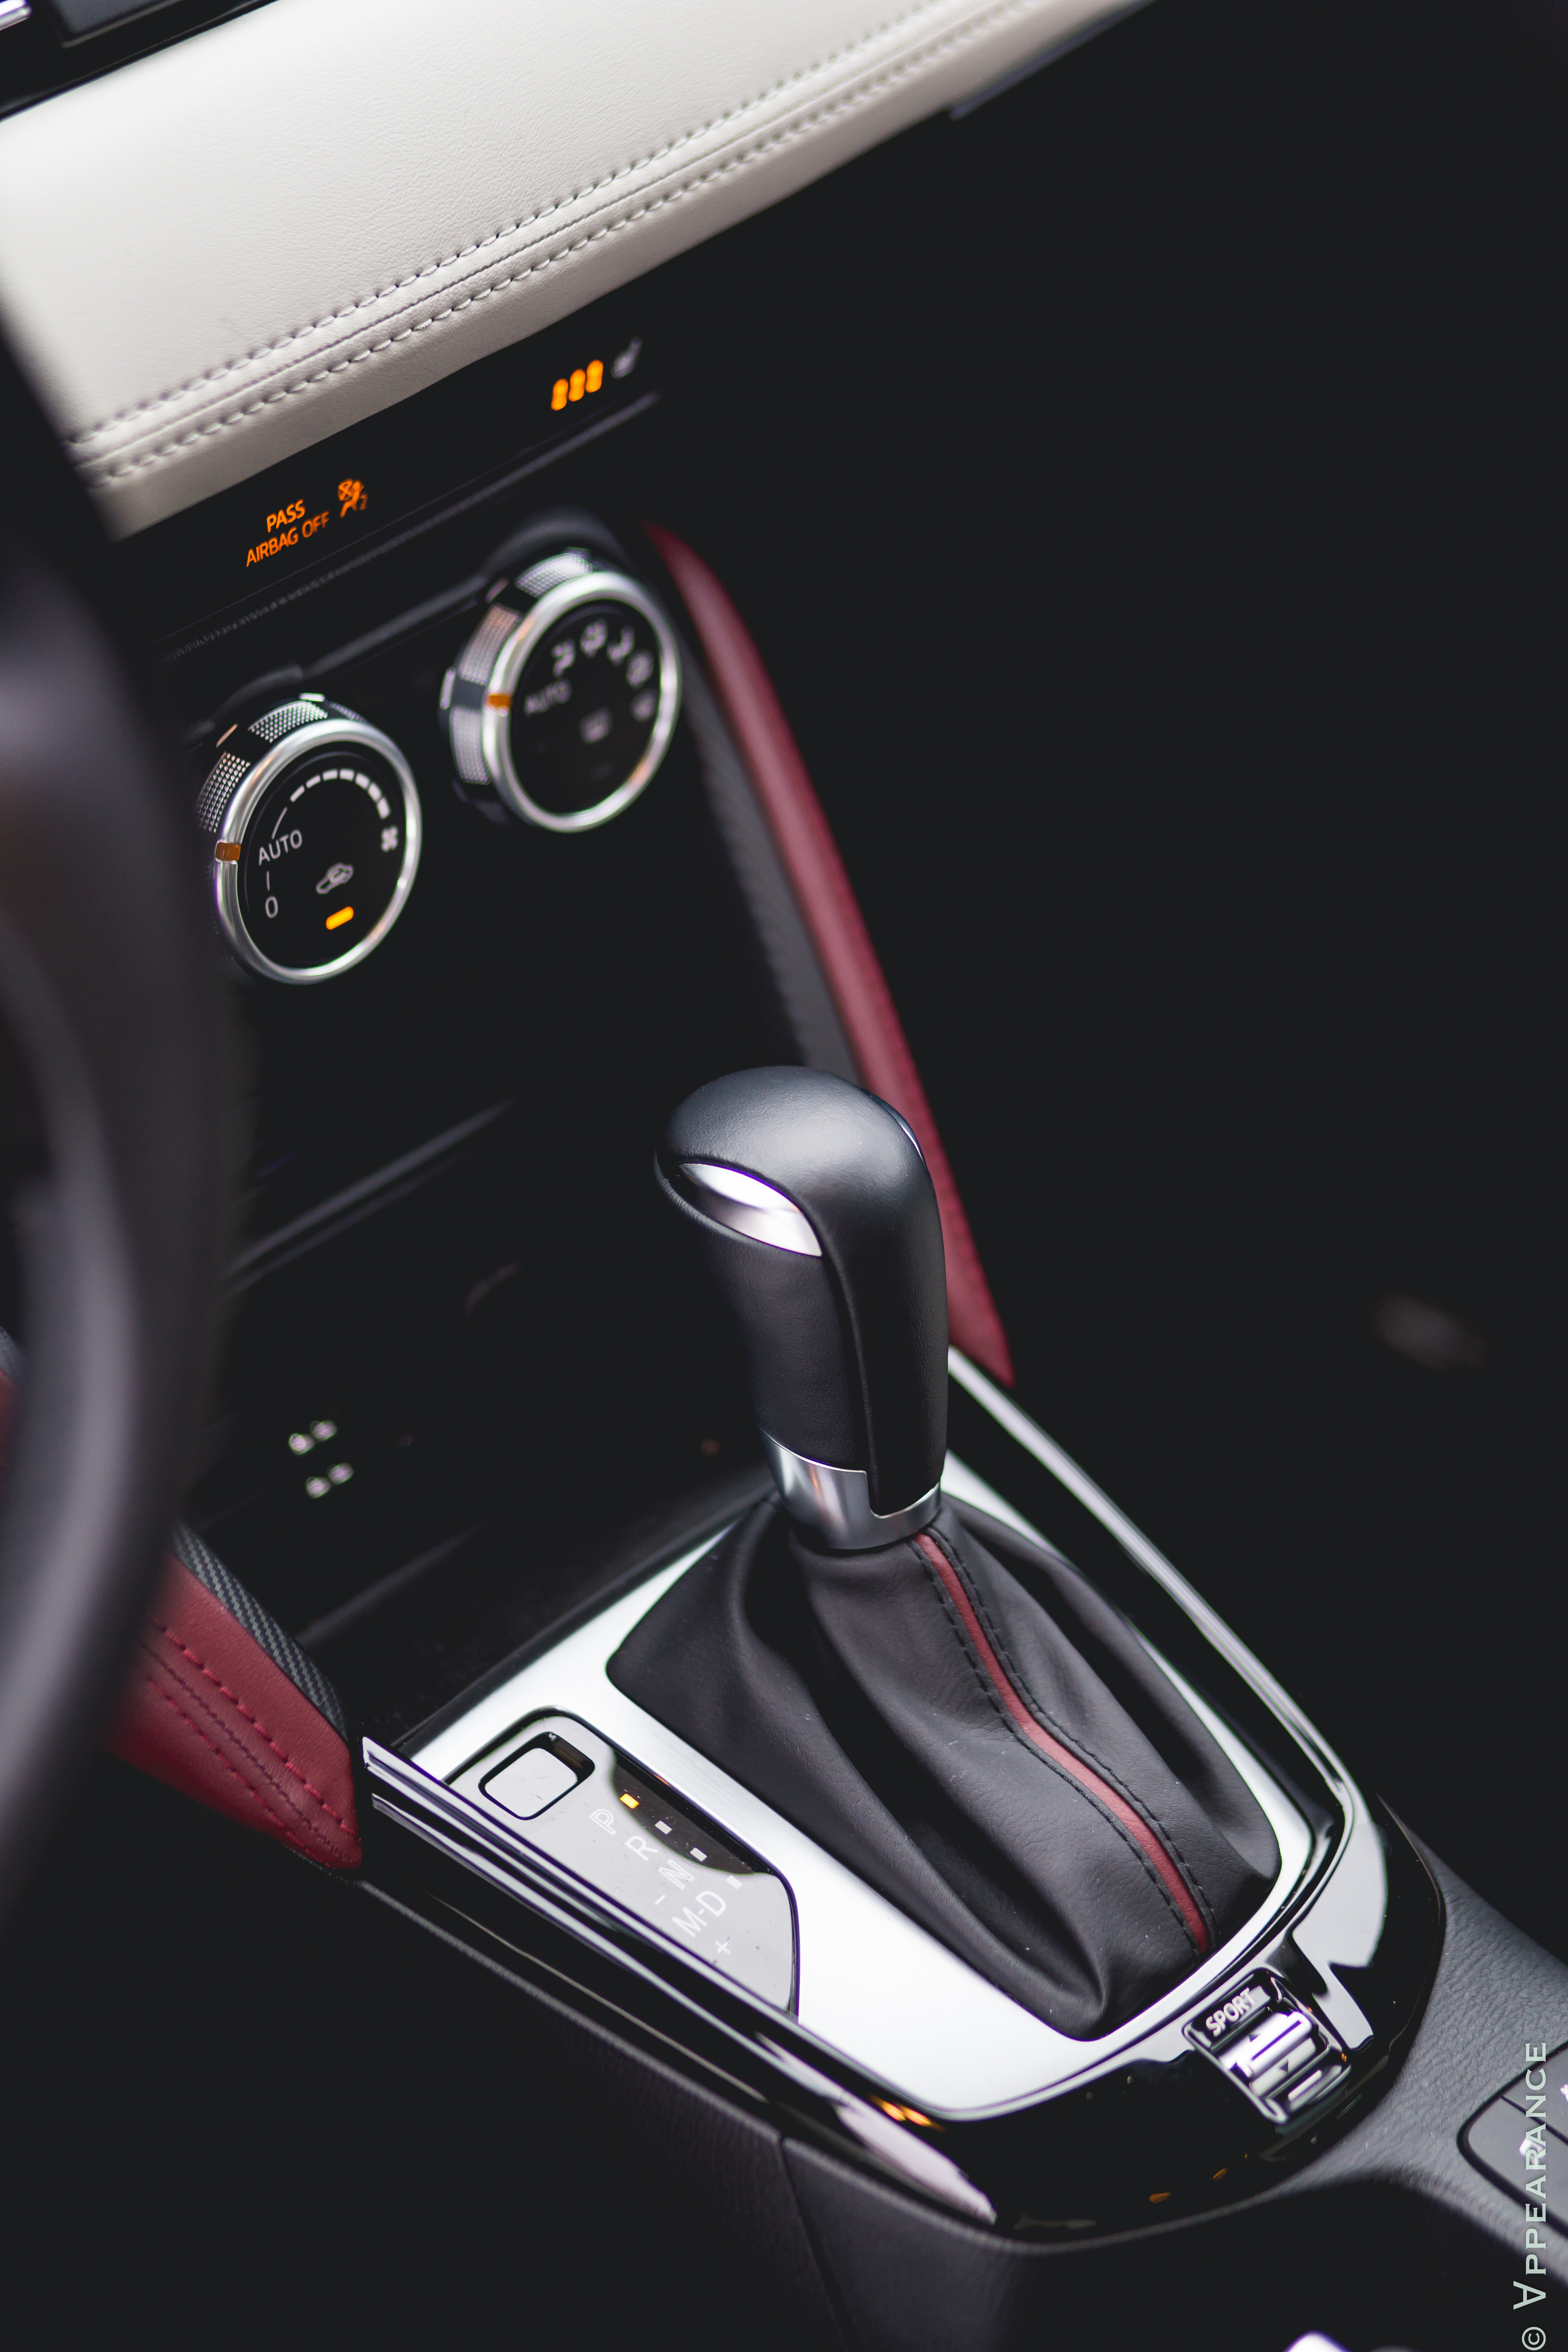 2016 Mazda CX-3 Transmission